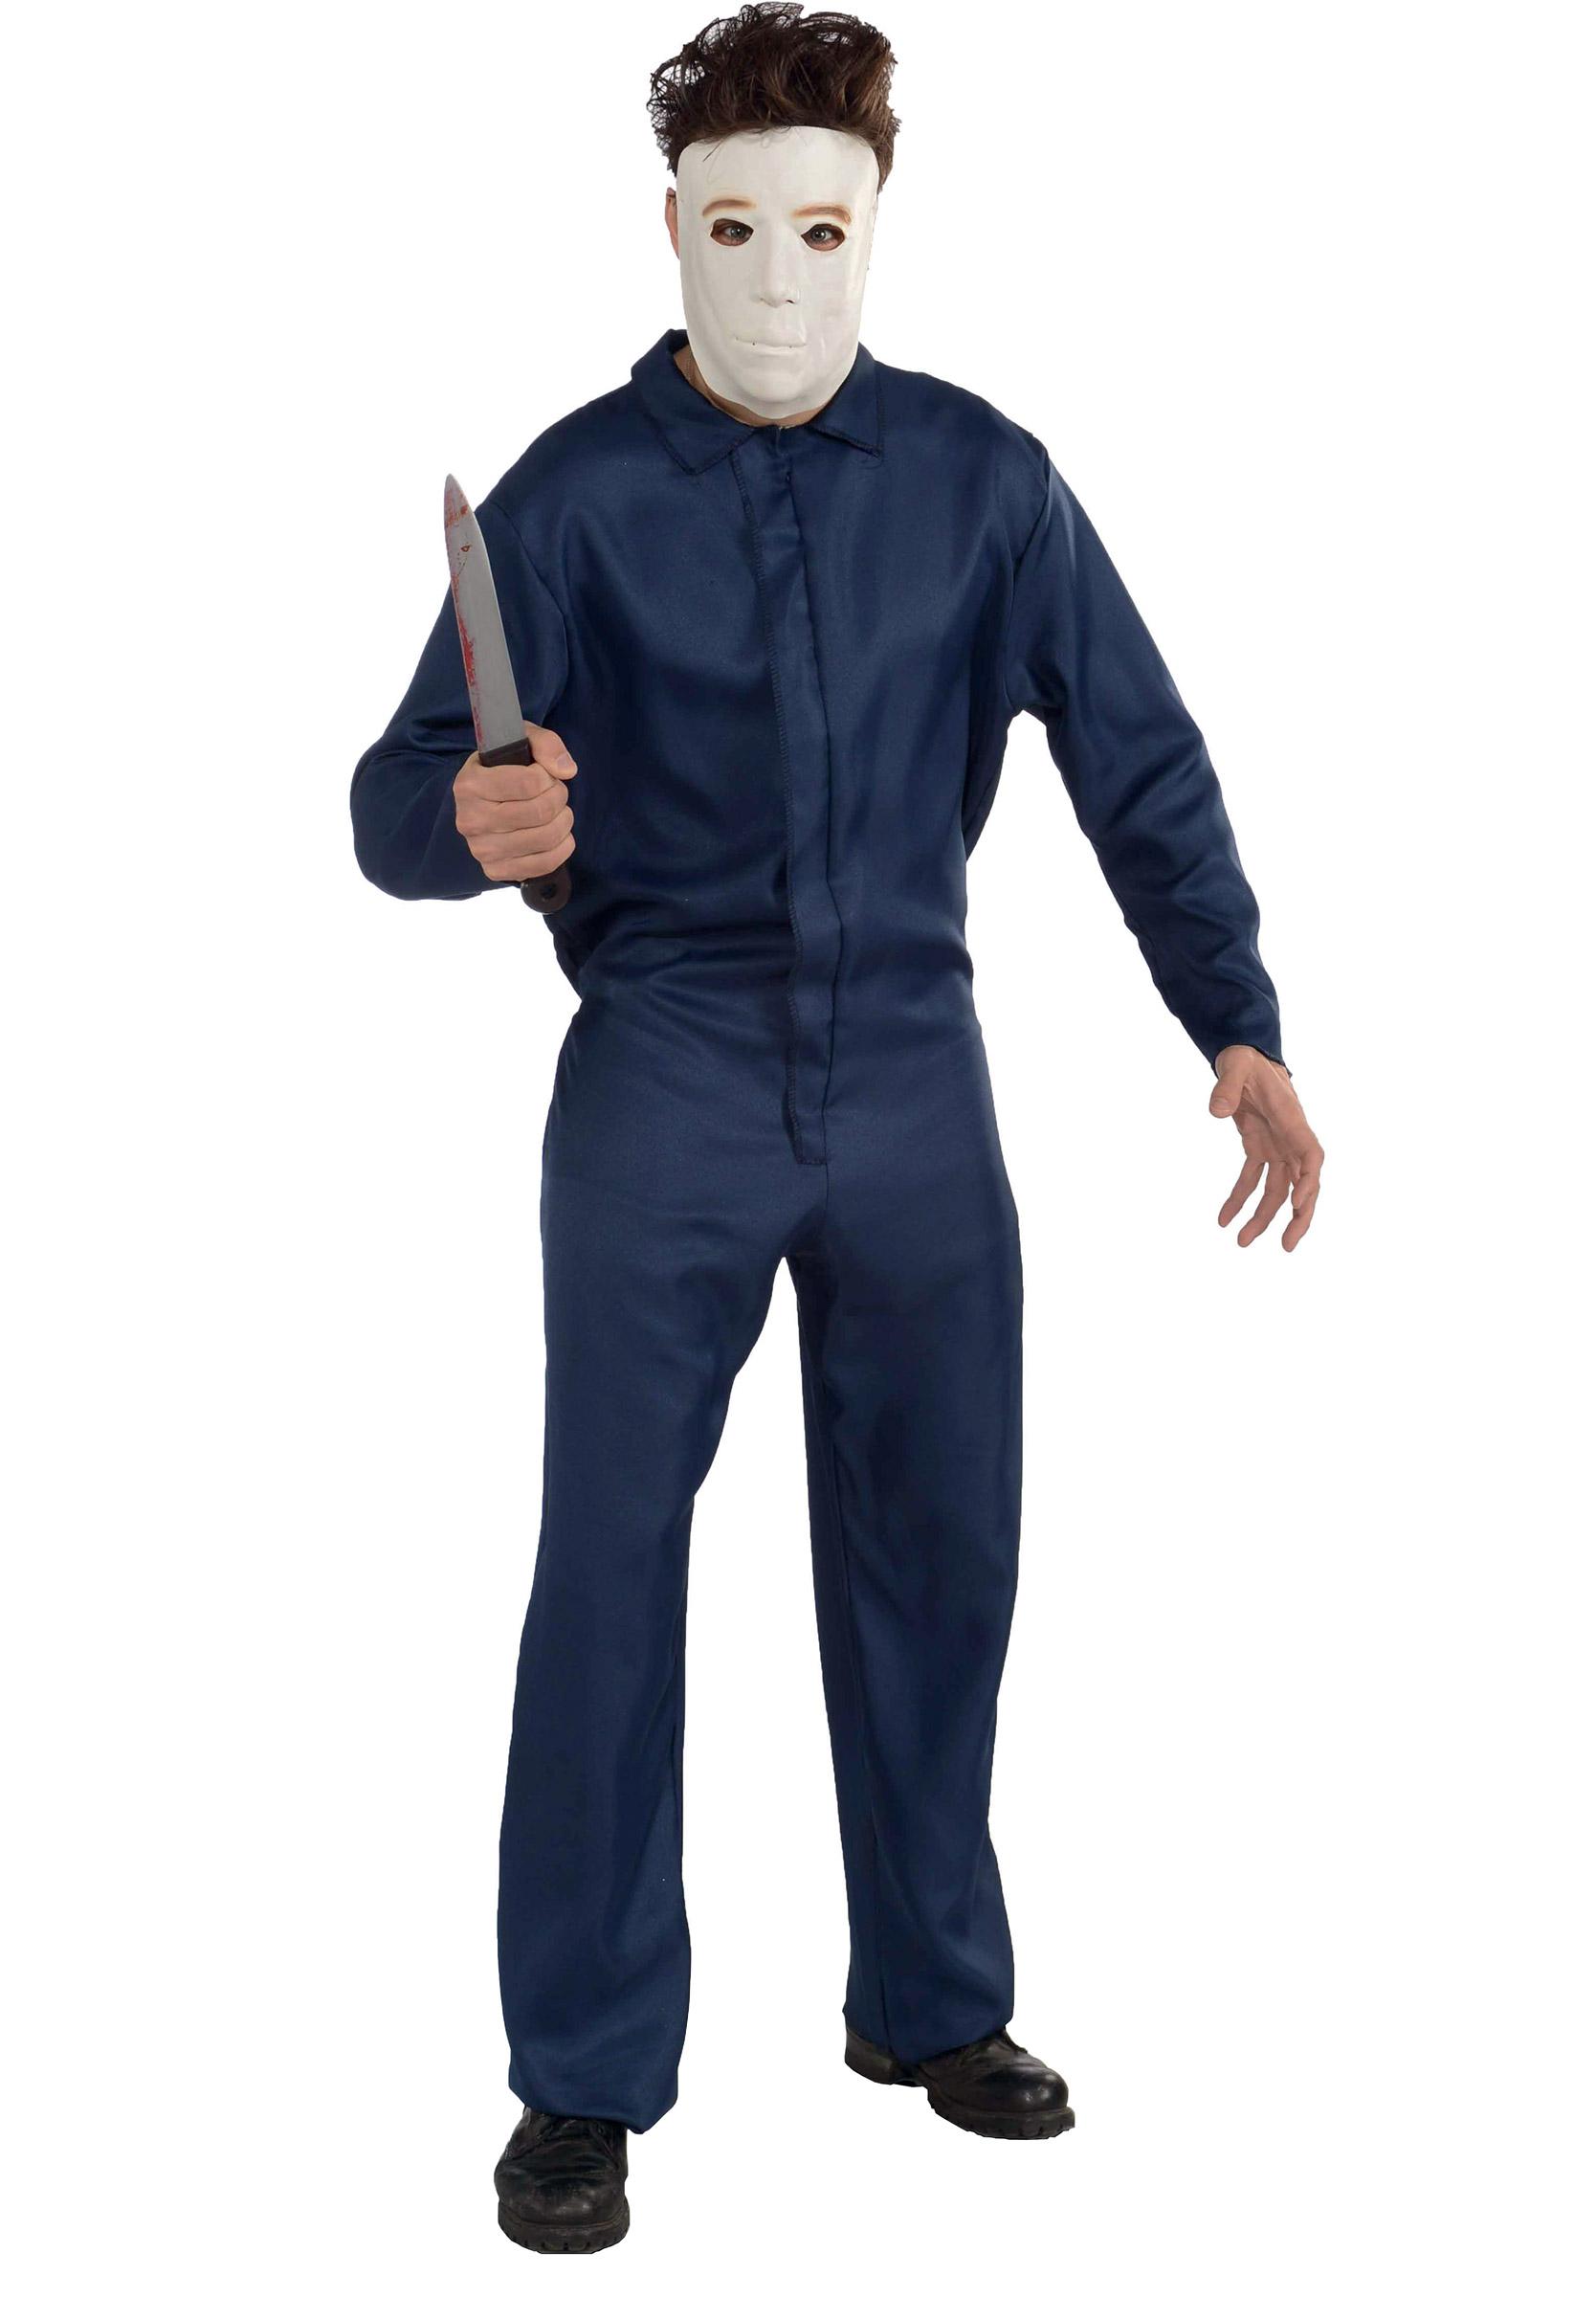 Disfraz Michael Myers Halloween hombre Disfraces adultosy